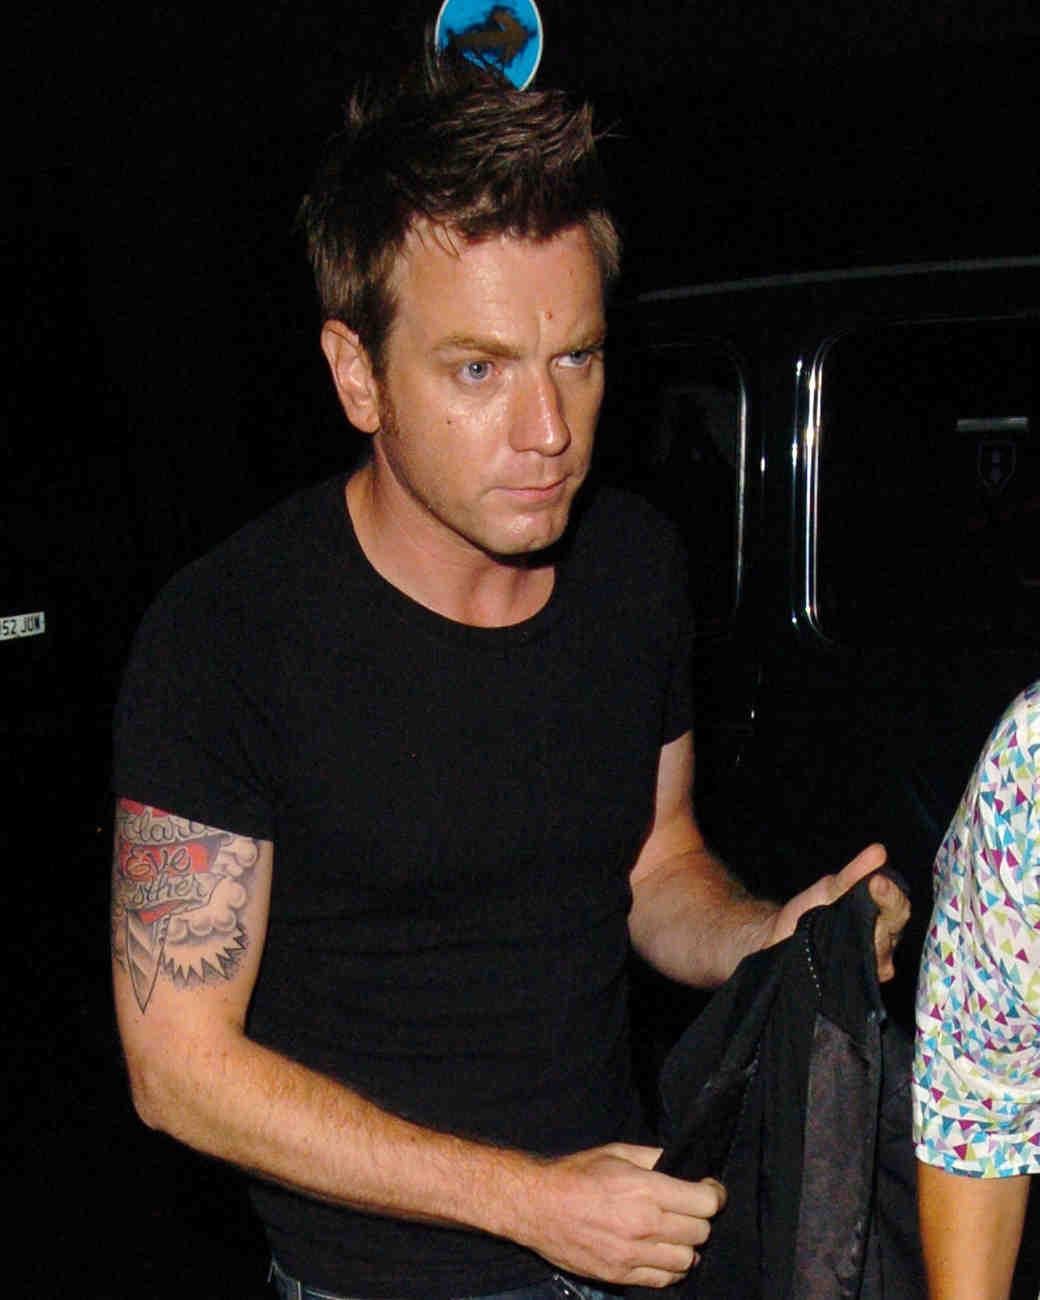 Ewan McGregor's Tattoo for Eve Mavrakis